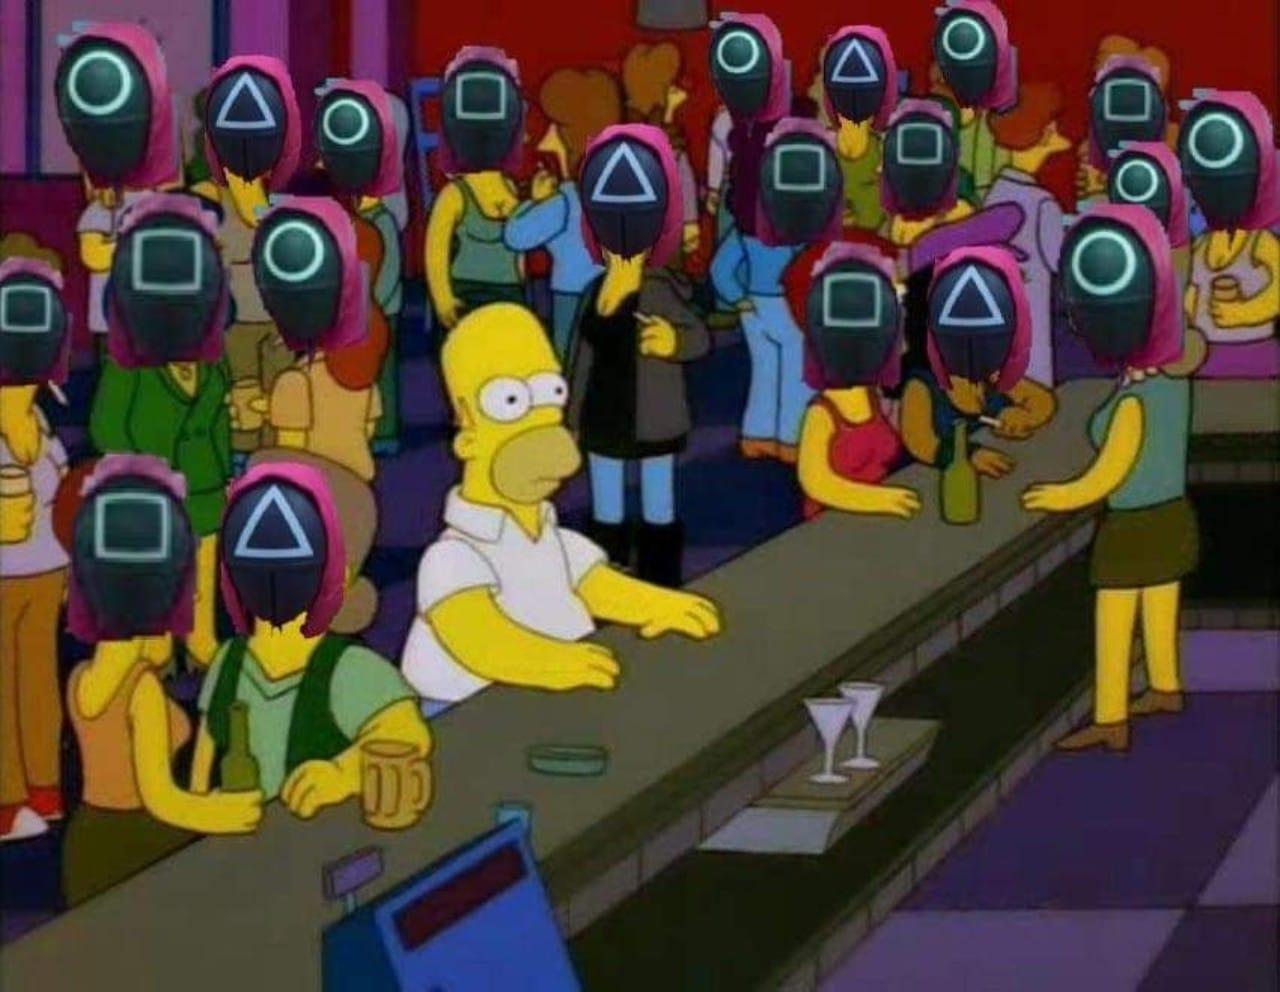 meme Homero Simpson viendo lo mismo